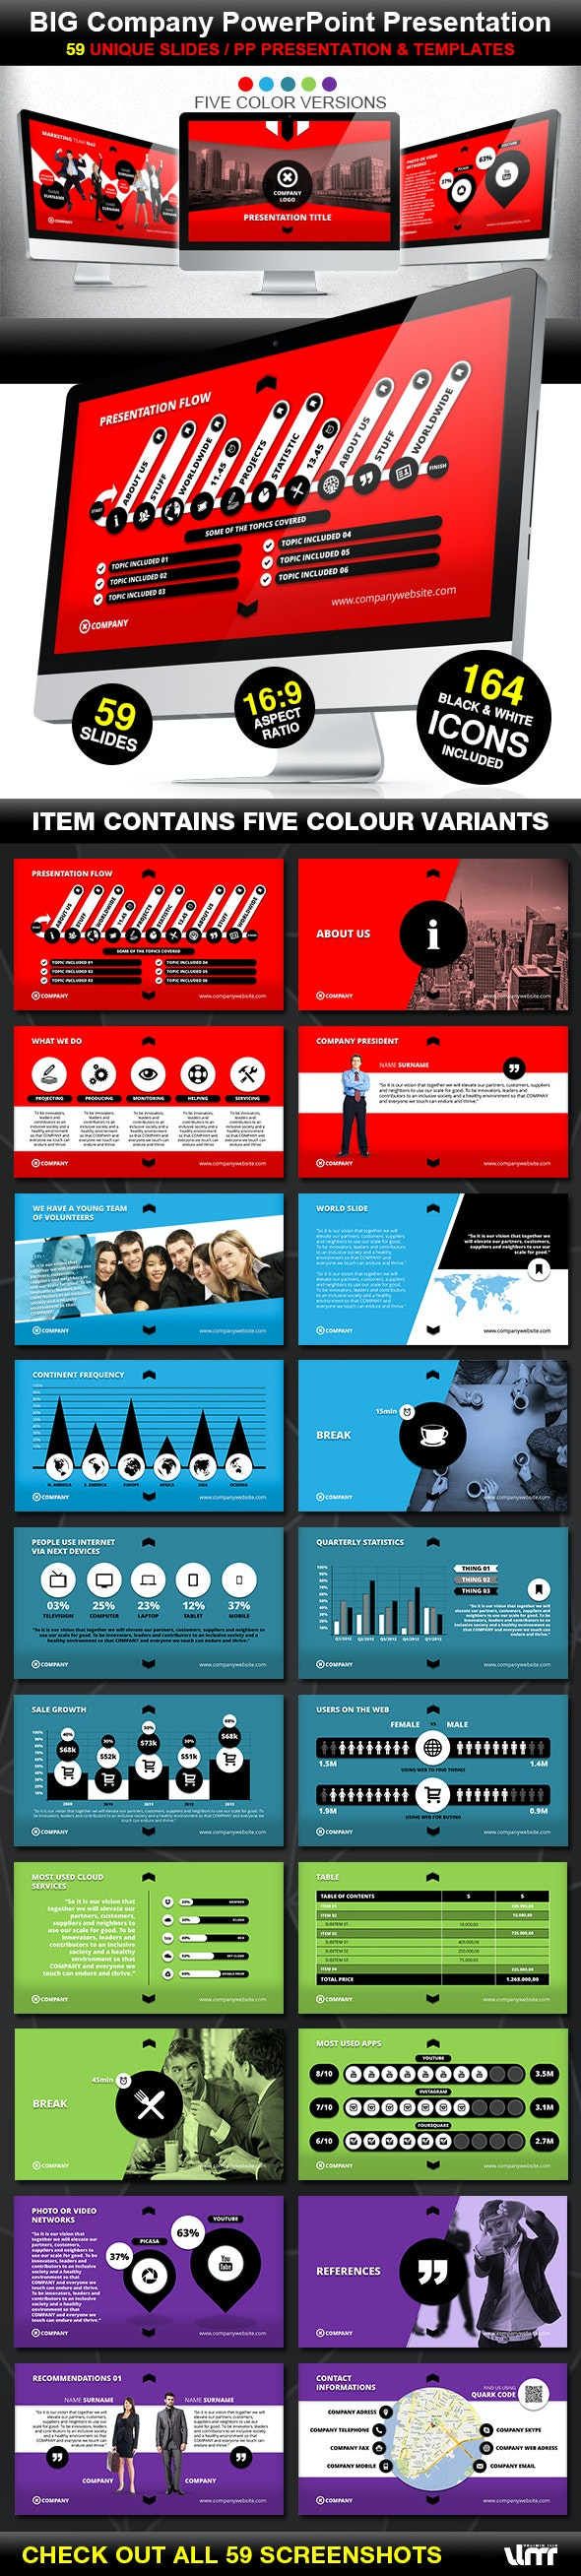 Big Company PowerPoint Prezentation Template - Business PowerPoint Templates